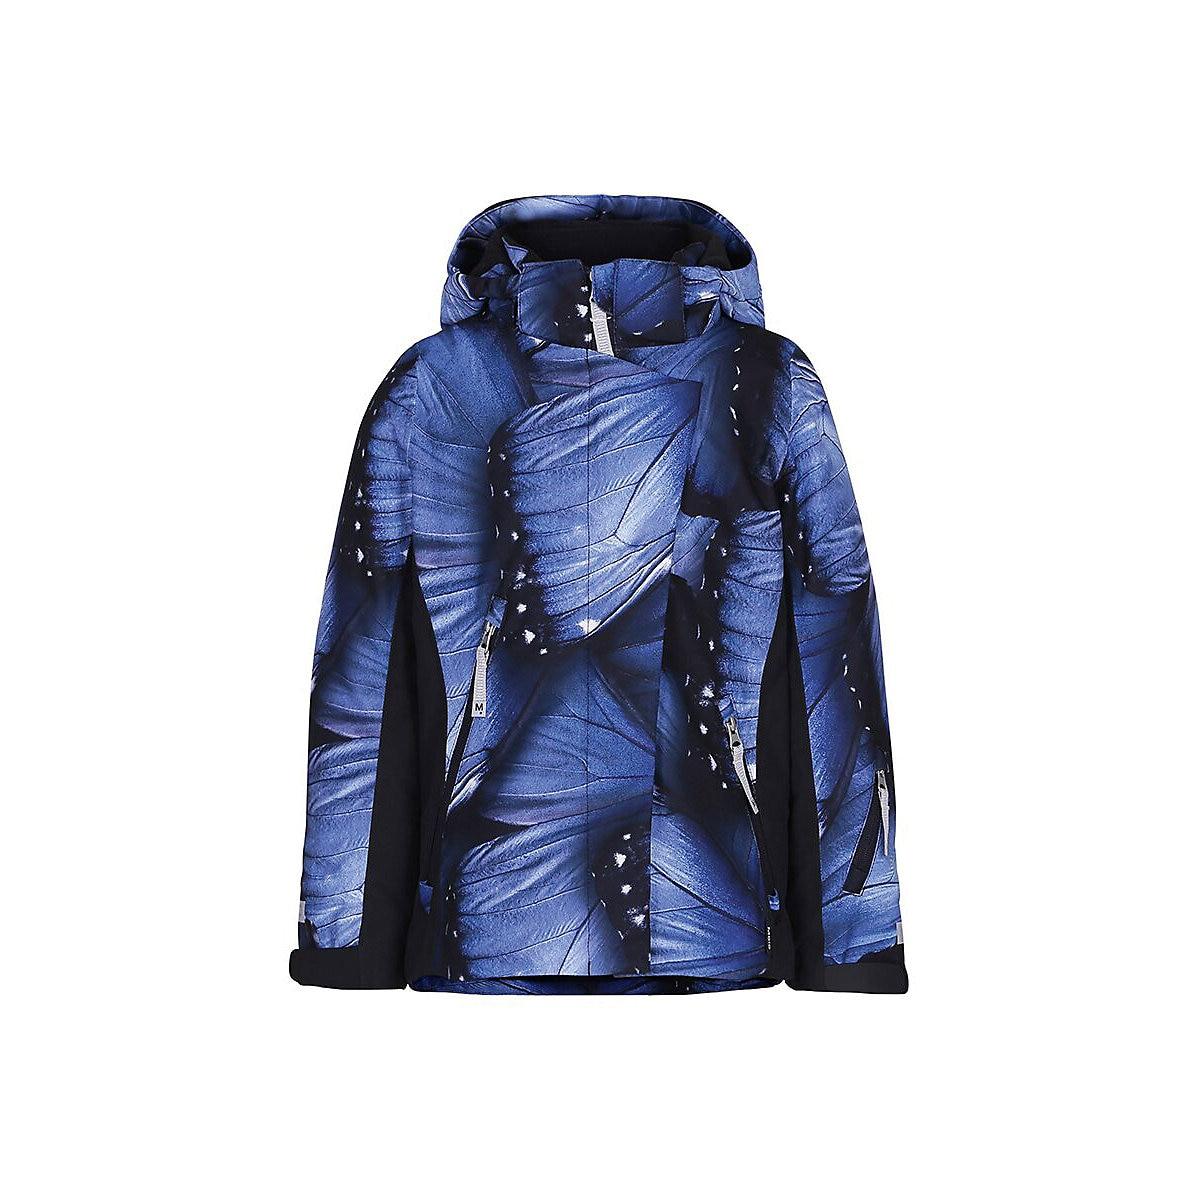 Jackets & Coats MOLO for girls 9170576 Jacket Coat Denim Cardigan Warm Children clothes Kids MTpromo ribbed hem zip up denim jacket